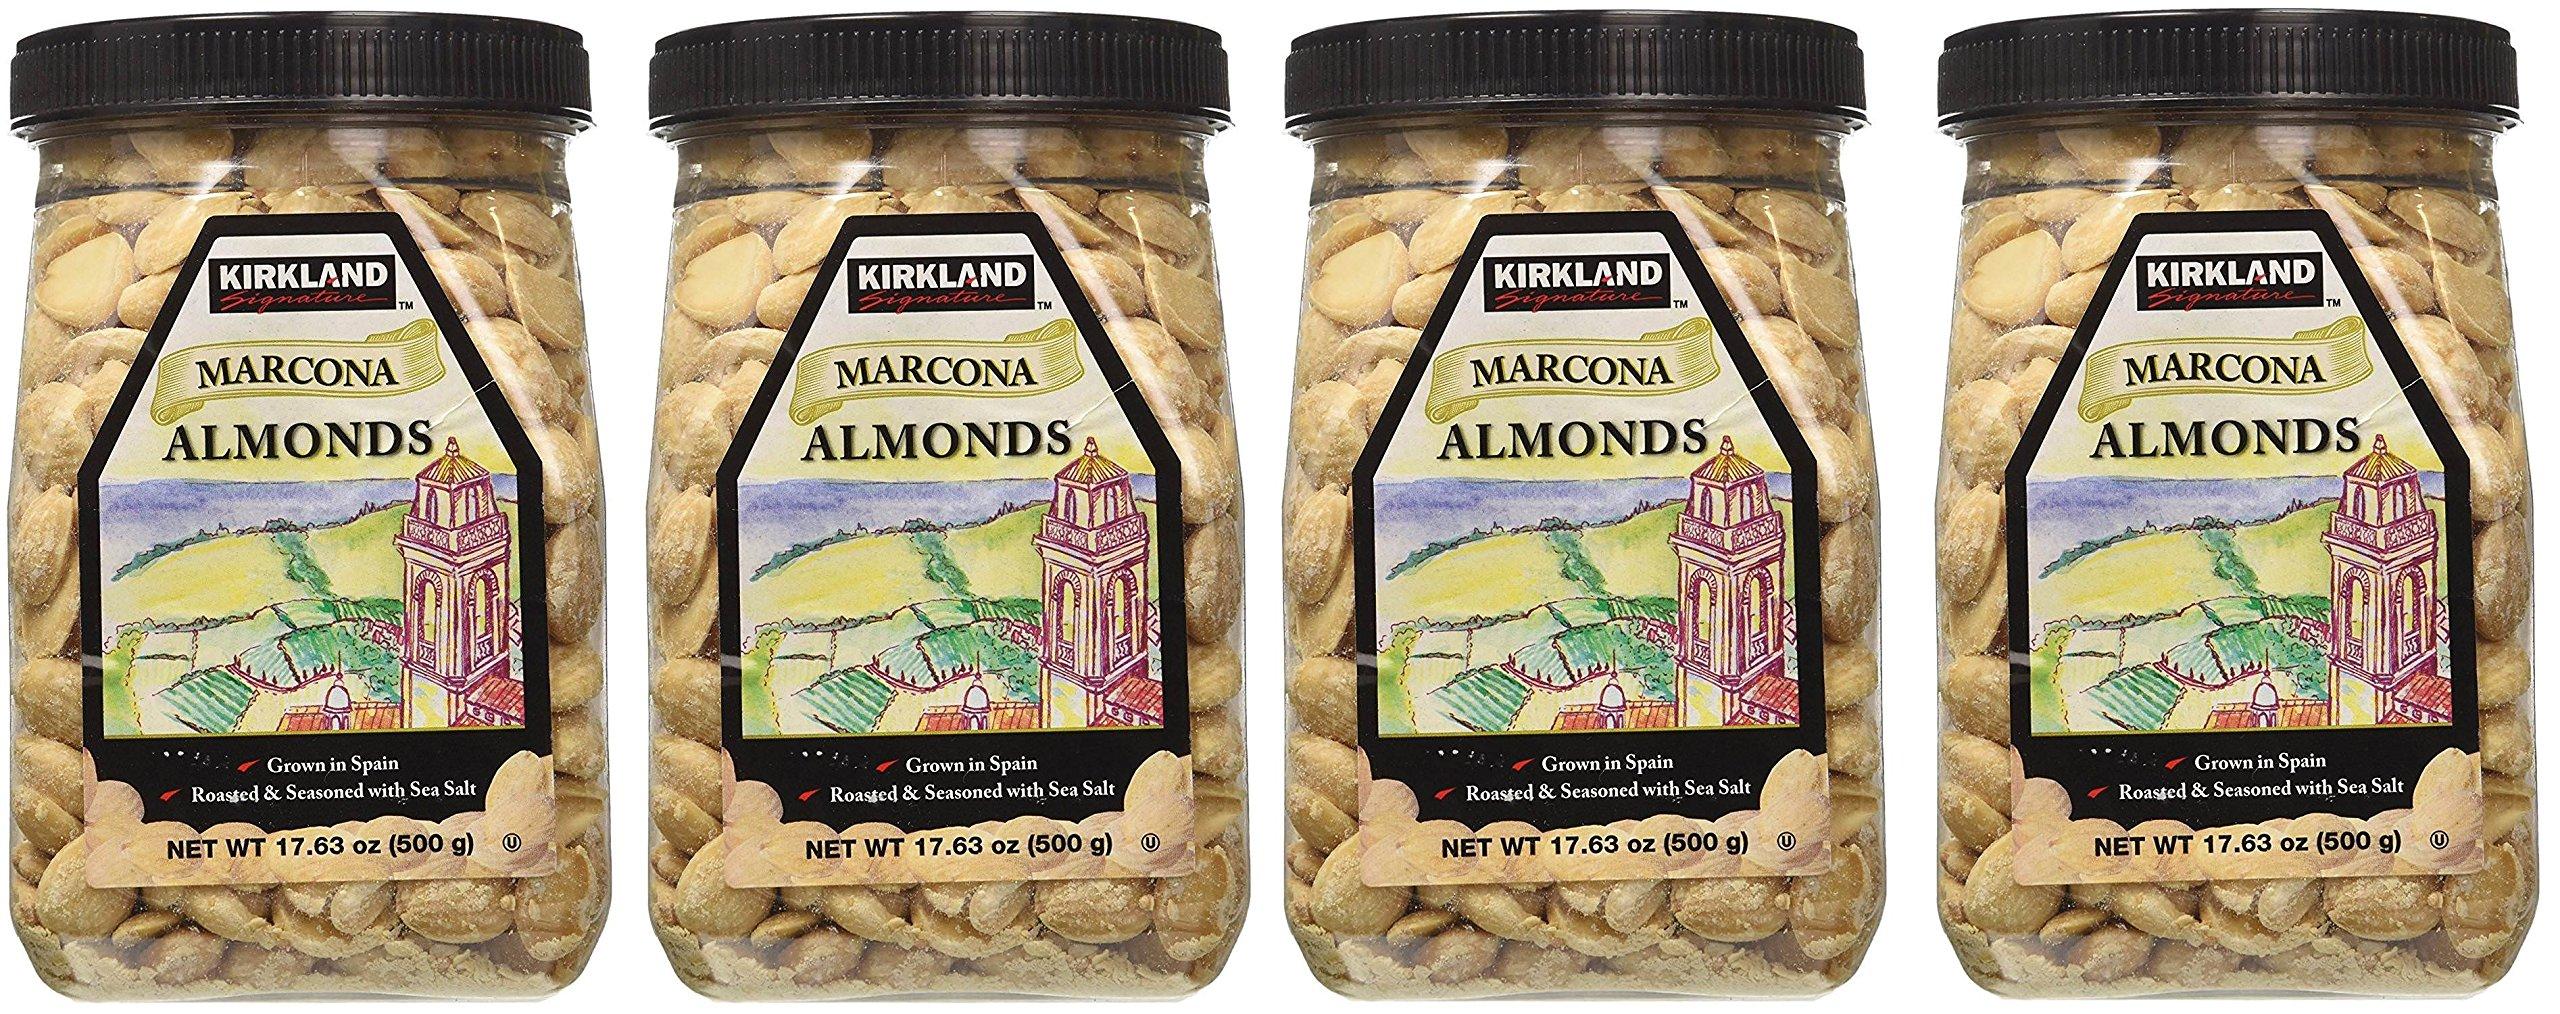 Kirkland Marcona Almonds, Roasted and Seasoned with Sea Salt, 17.63 Ounce (4 Pack)